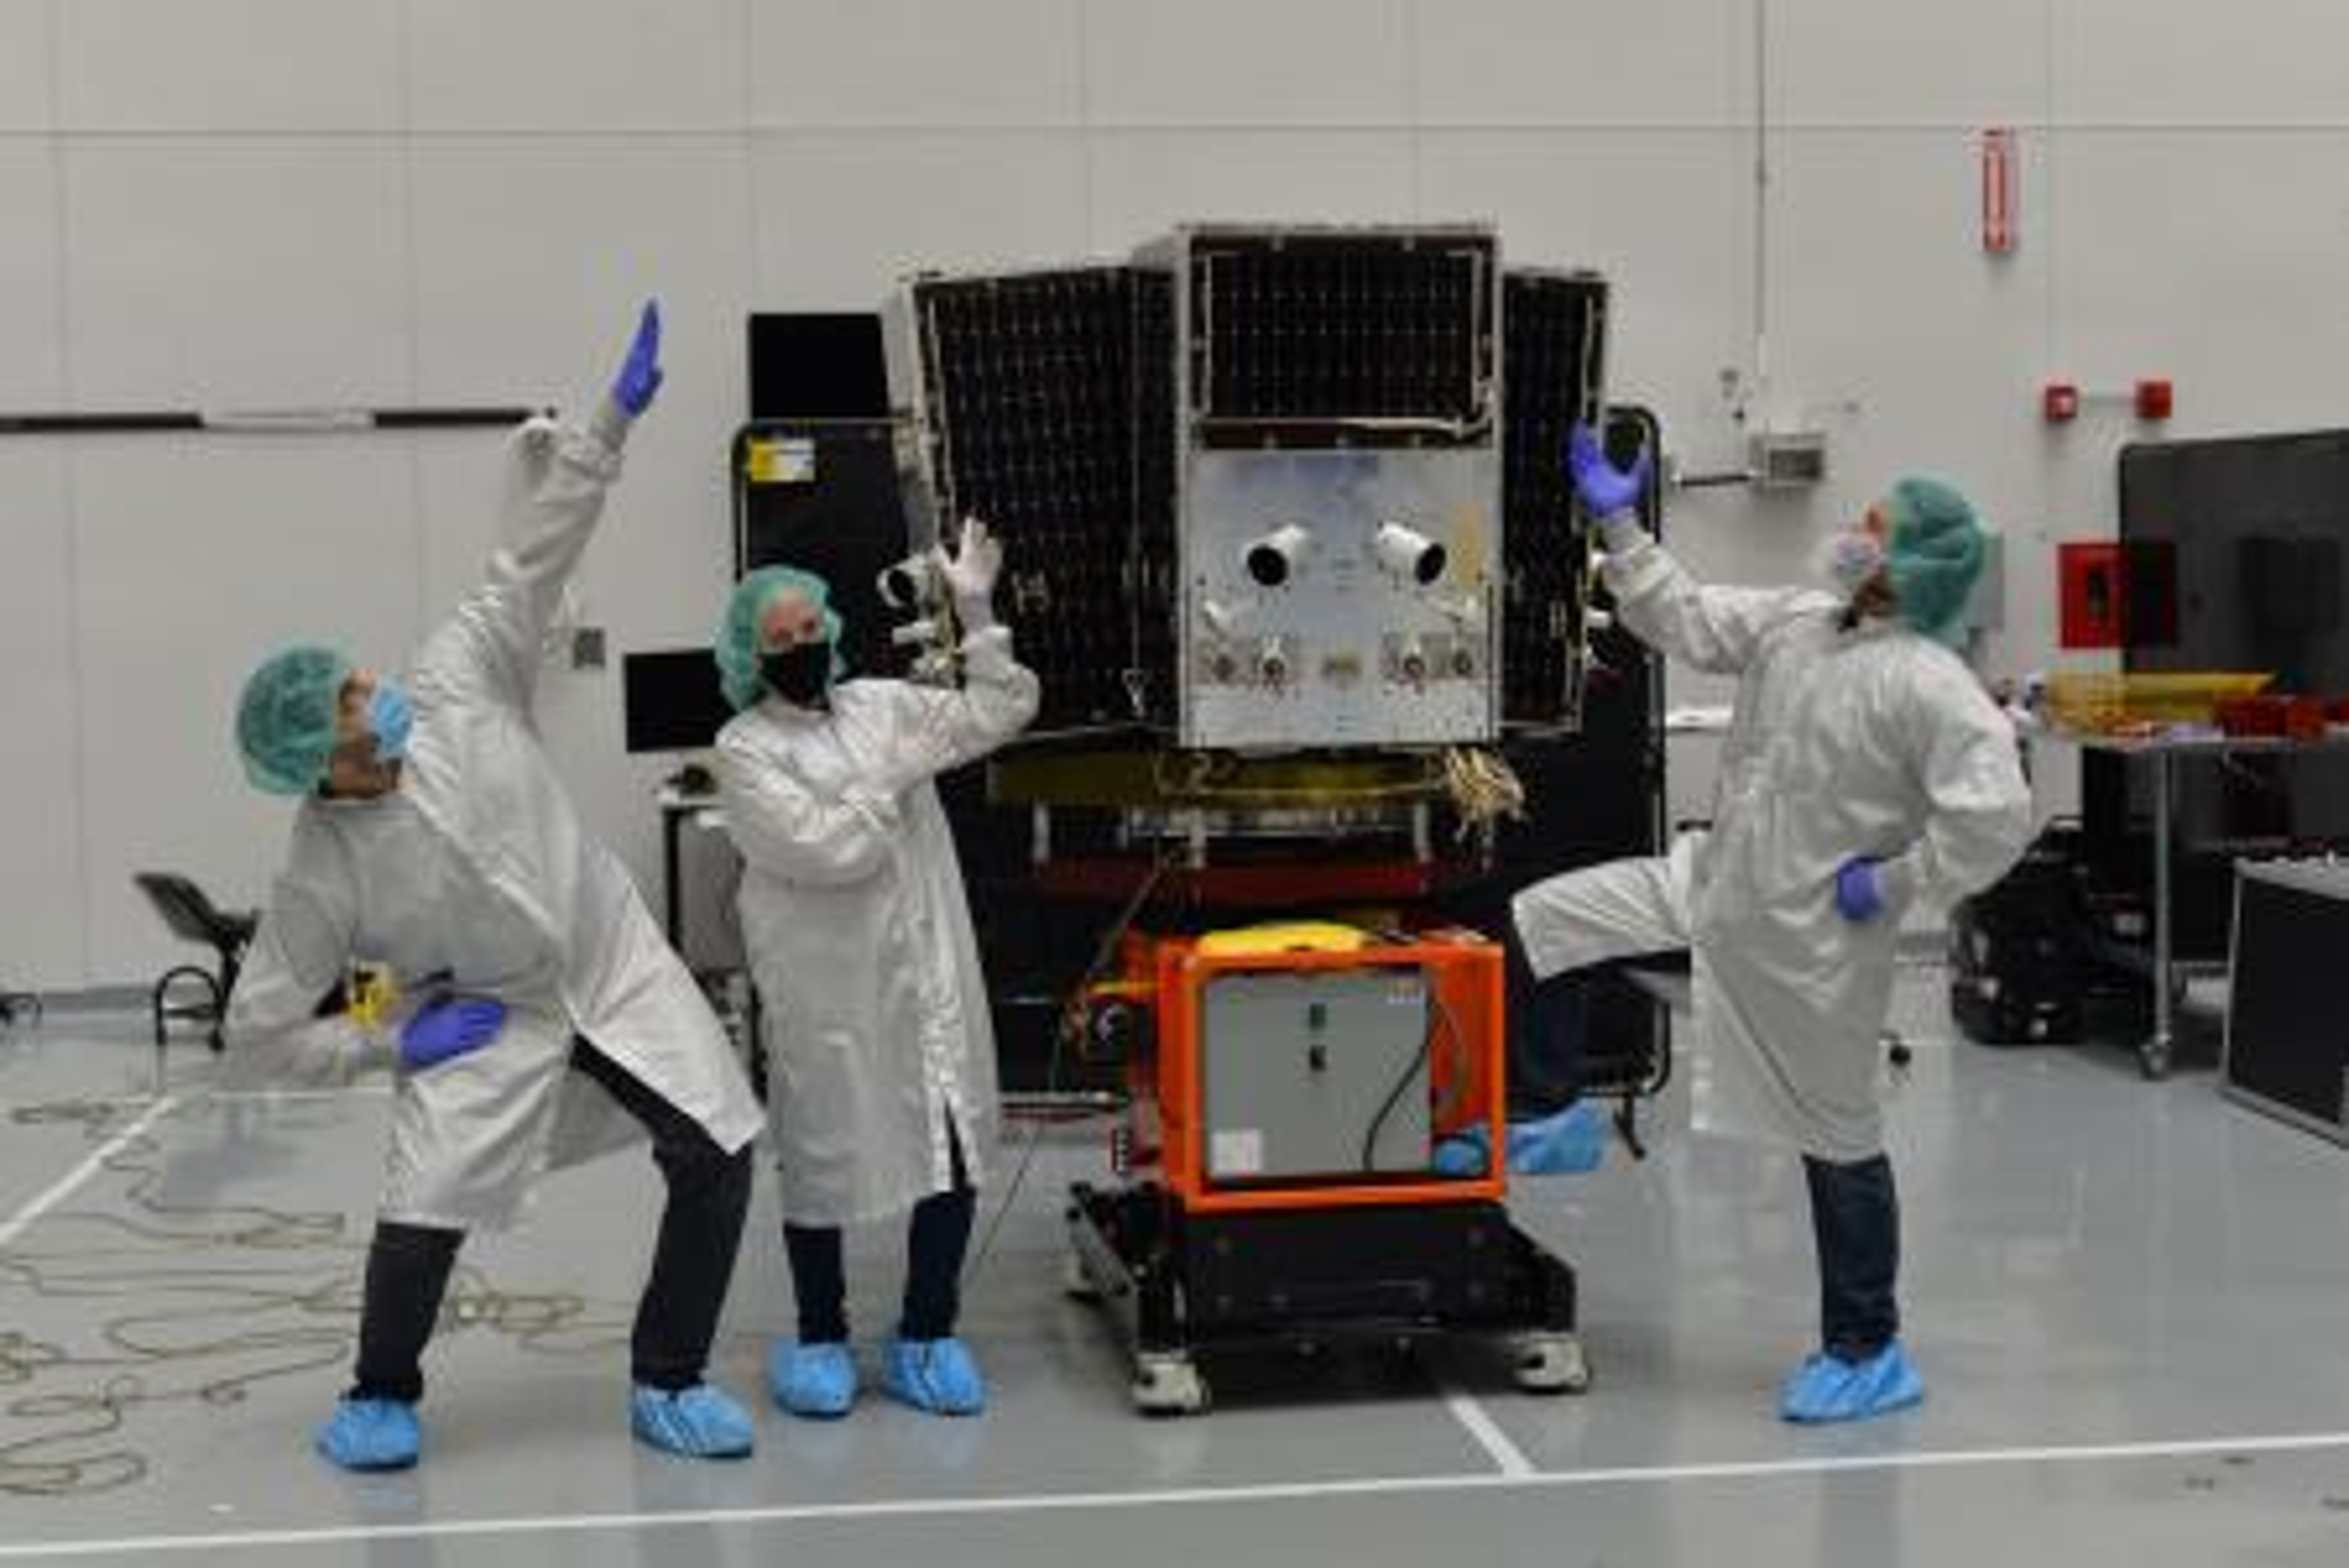 Planet staff Michael Soulage, Natasha Nogueira, Raul Antonio Perez prepare a SkySat for launch.